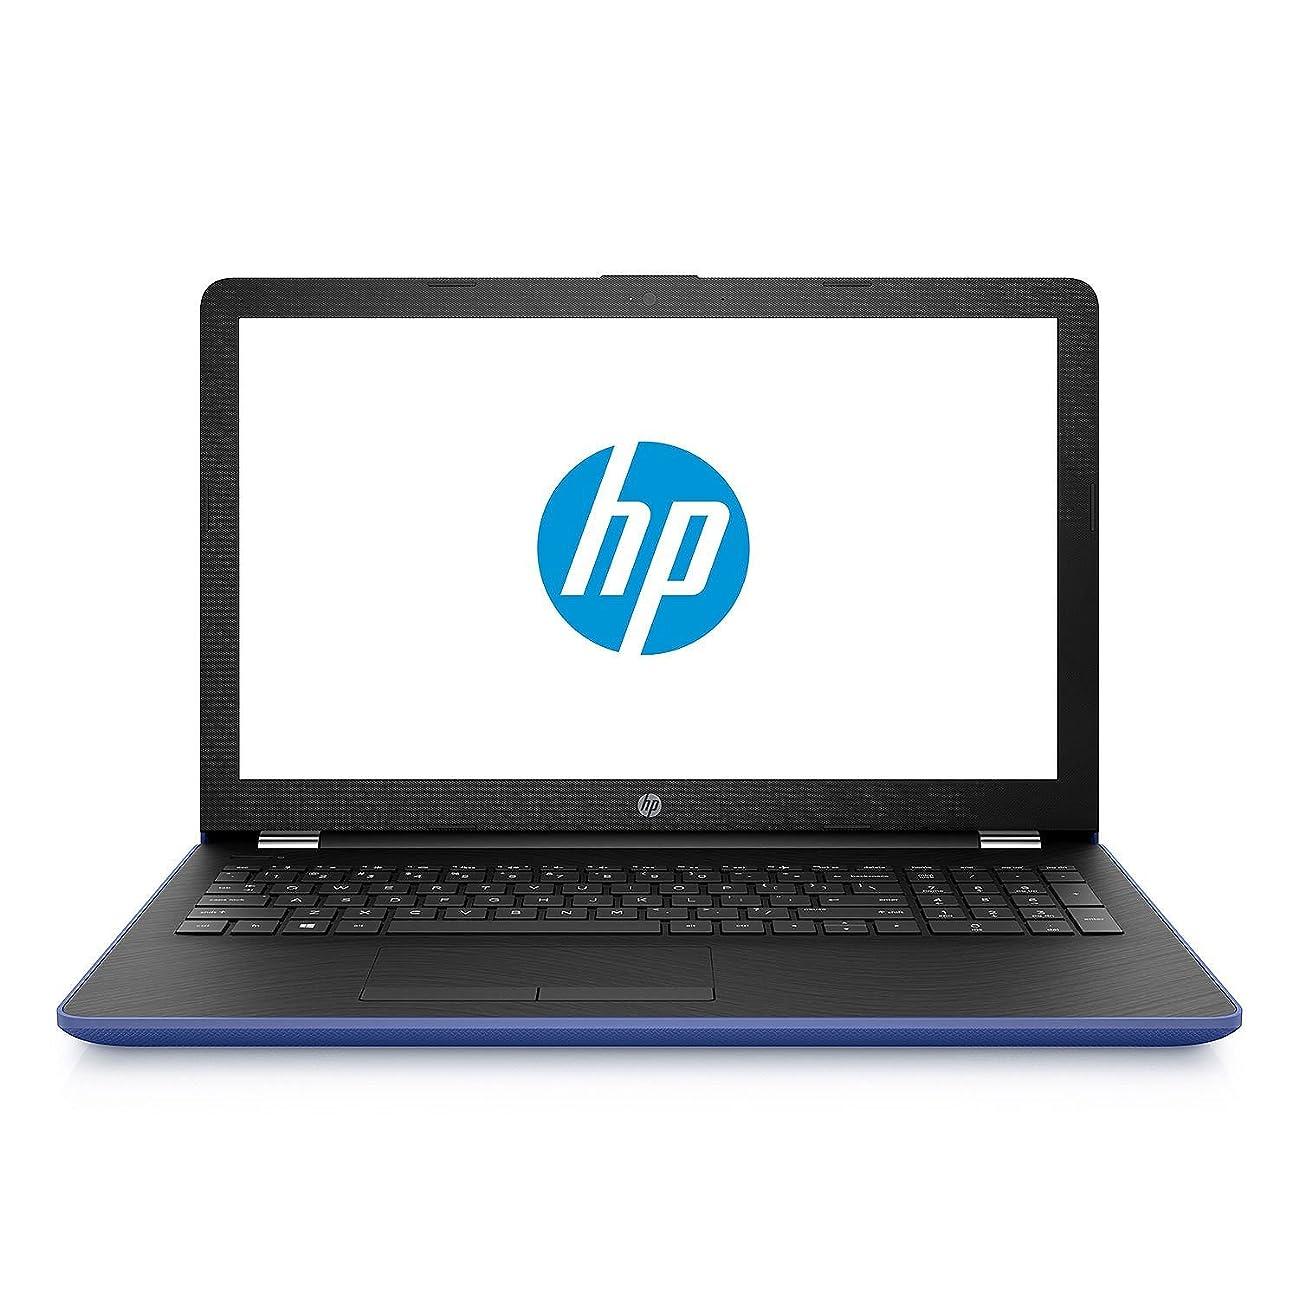 2019 Newest HP 15.6 Inch Premium Flagship Notebook Laptop Computer (Intel Core i5-8250U 1.6GHz, 8GB DDR4 RAM, 1TB HDD, HD Dual Speakers, Intel UHD Graphics 620, HD Webcam, Windows 10) Blue